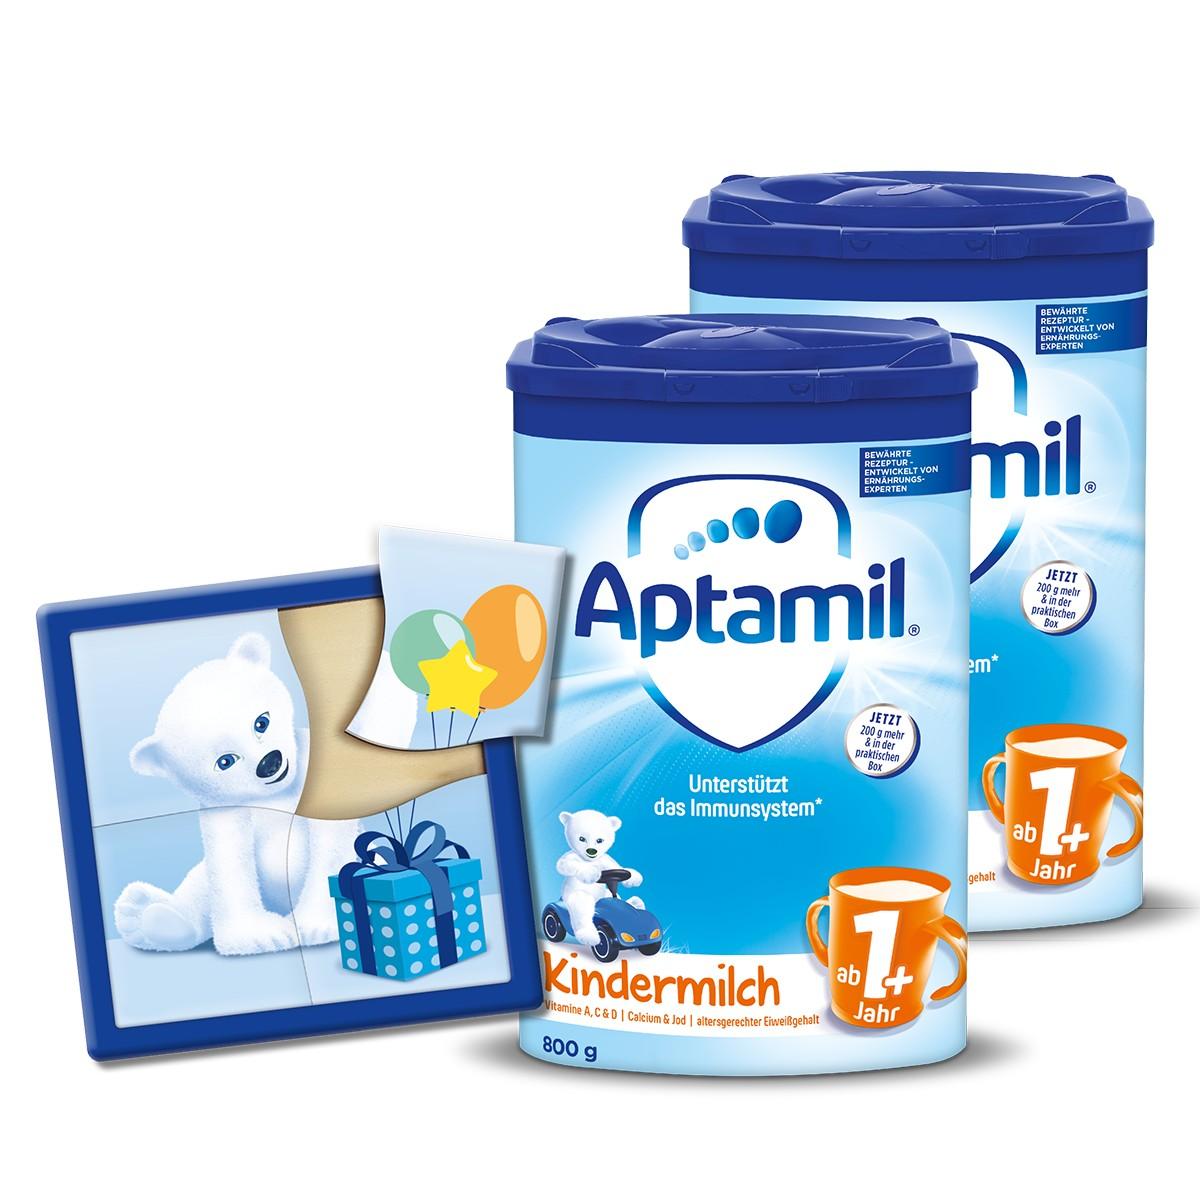 Aptamil gum bundle kindermilch1 haba packshot